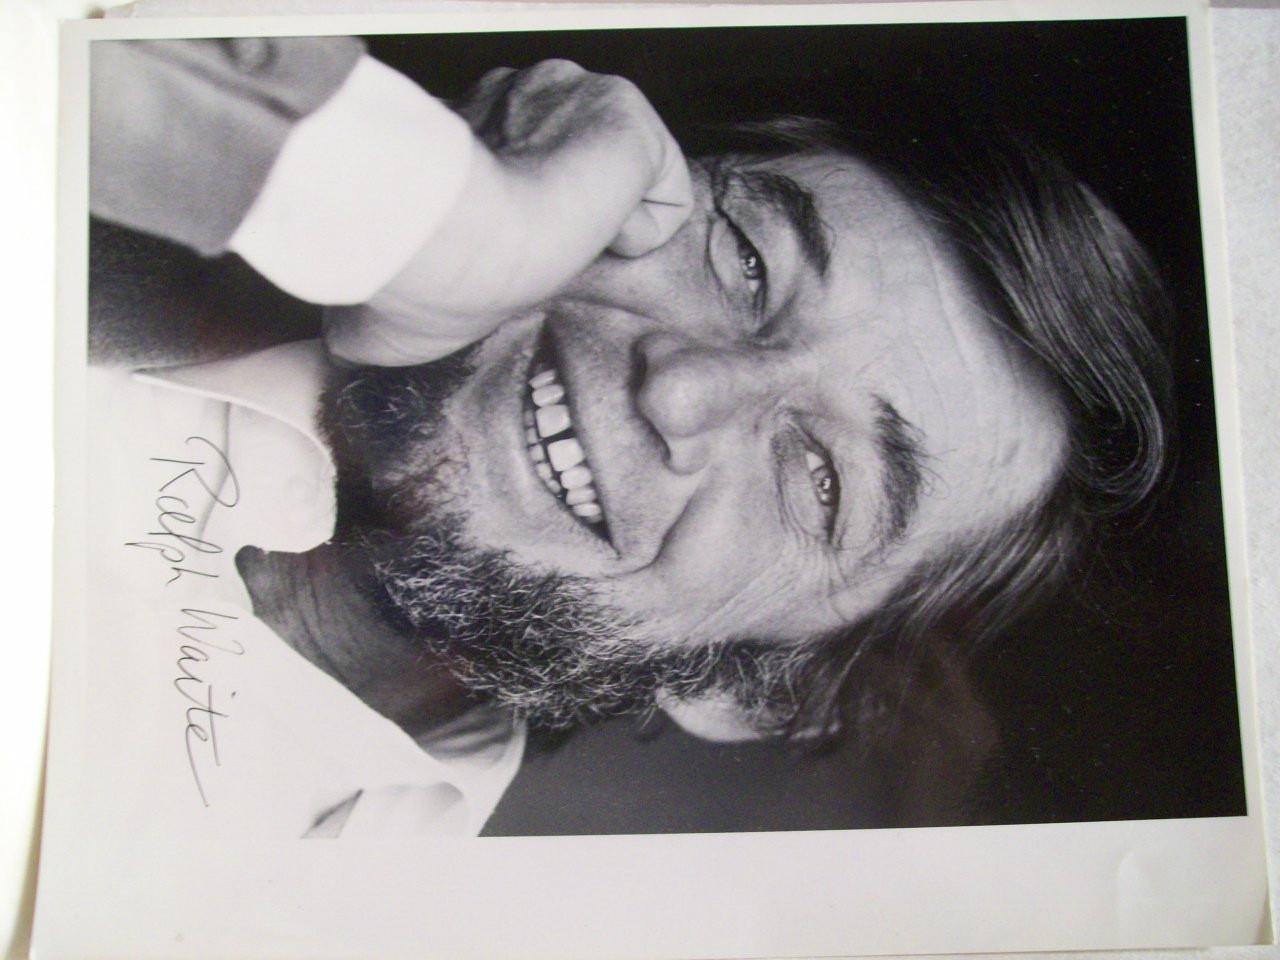 Waite, Ralph Photo Signed Autograph Carnivale The Waltons